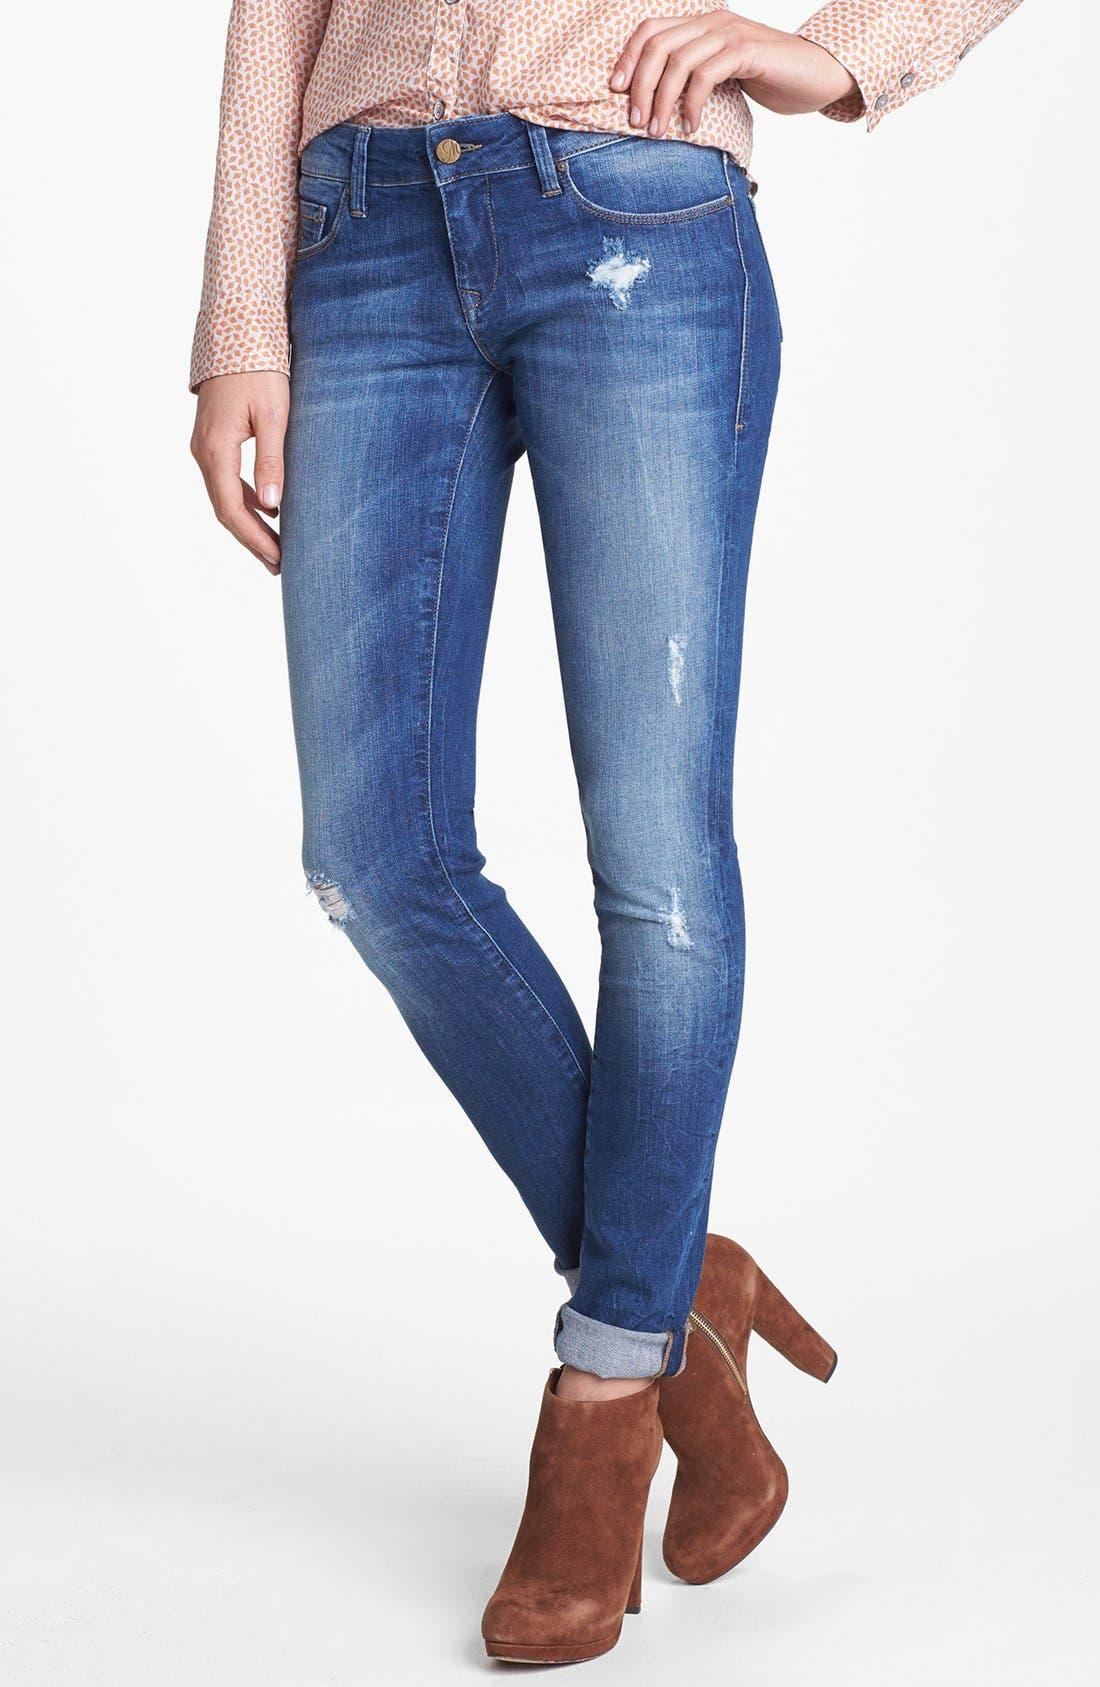 Alternate Image 1 Selected - Mavi Jeans 'Serena' Super Skinny Jeans (Indigo Vintage)